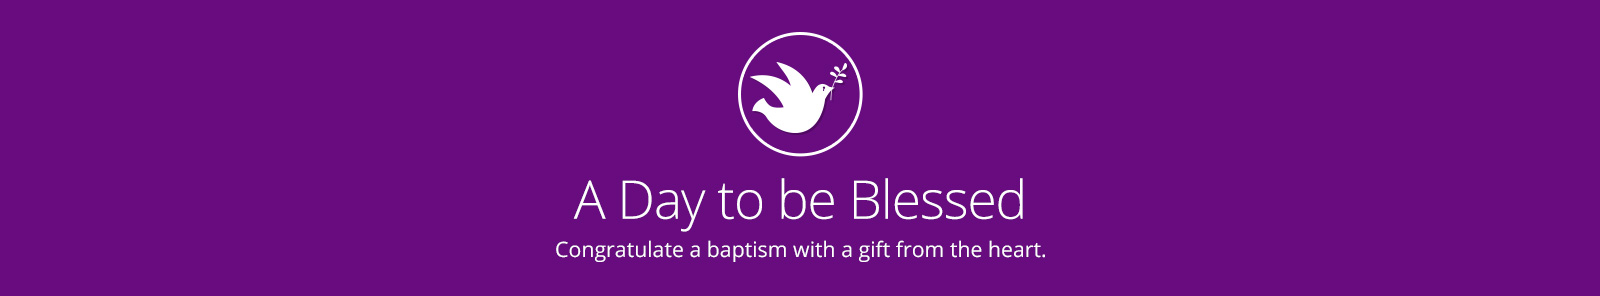 Baptism Gifts Banner